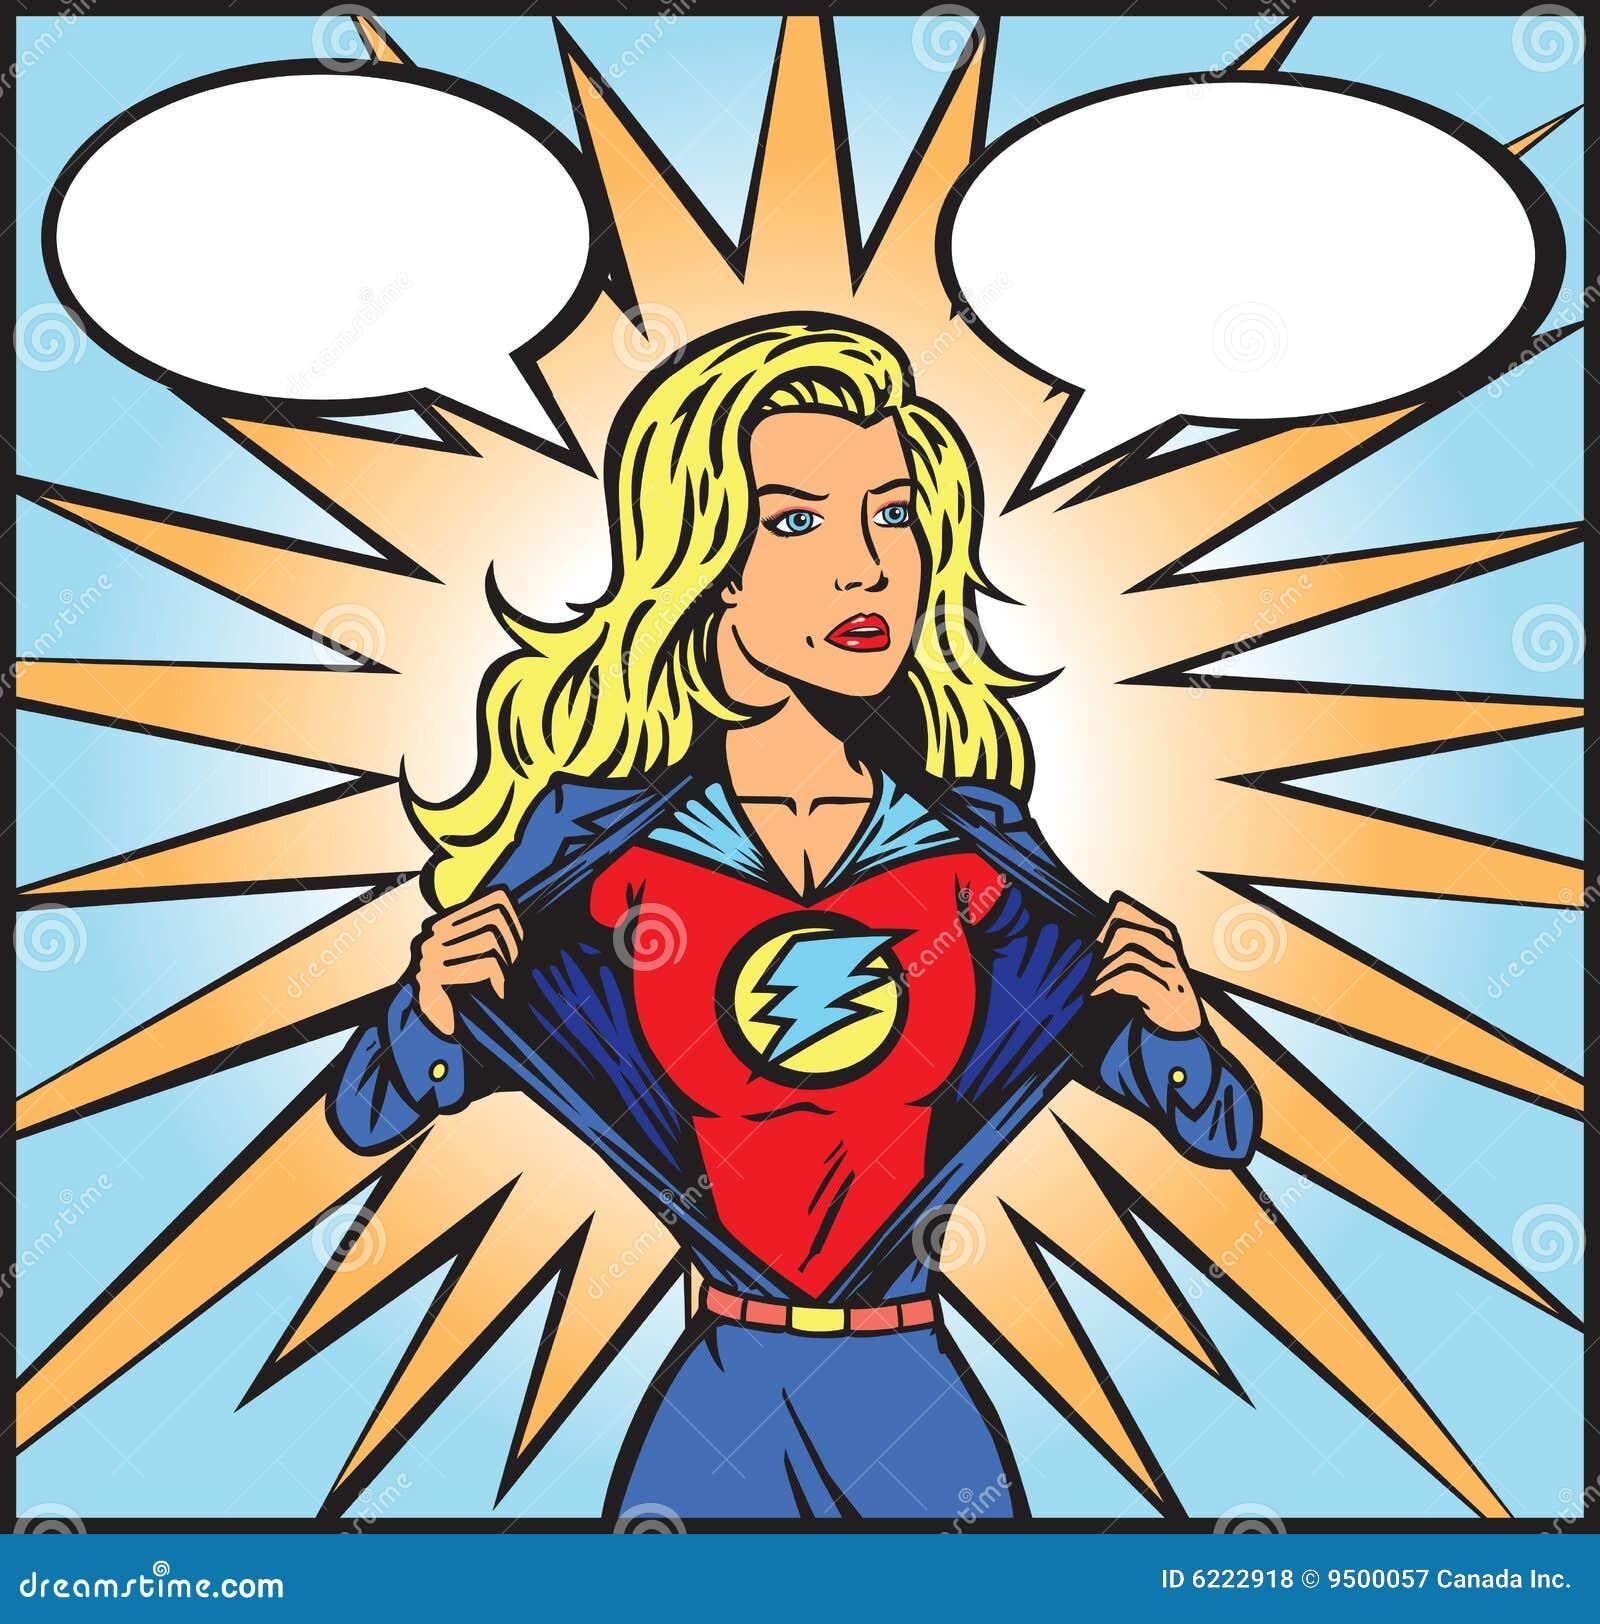 Superwomancomic